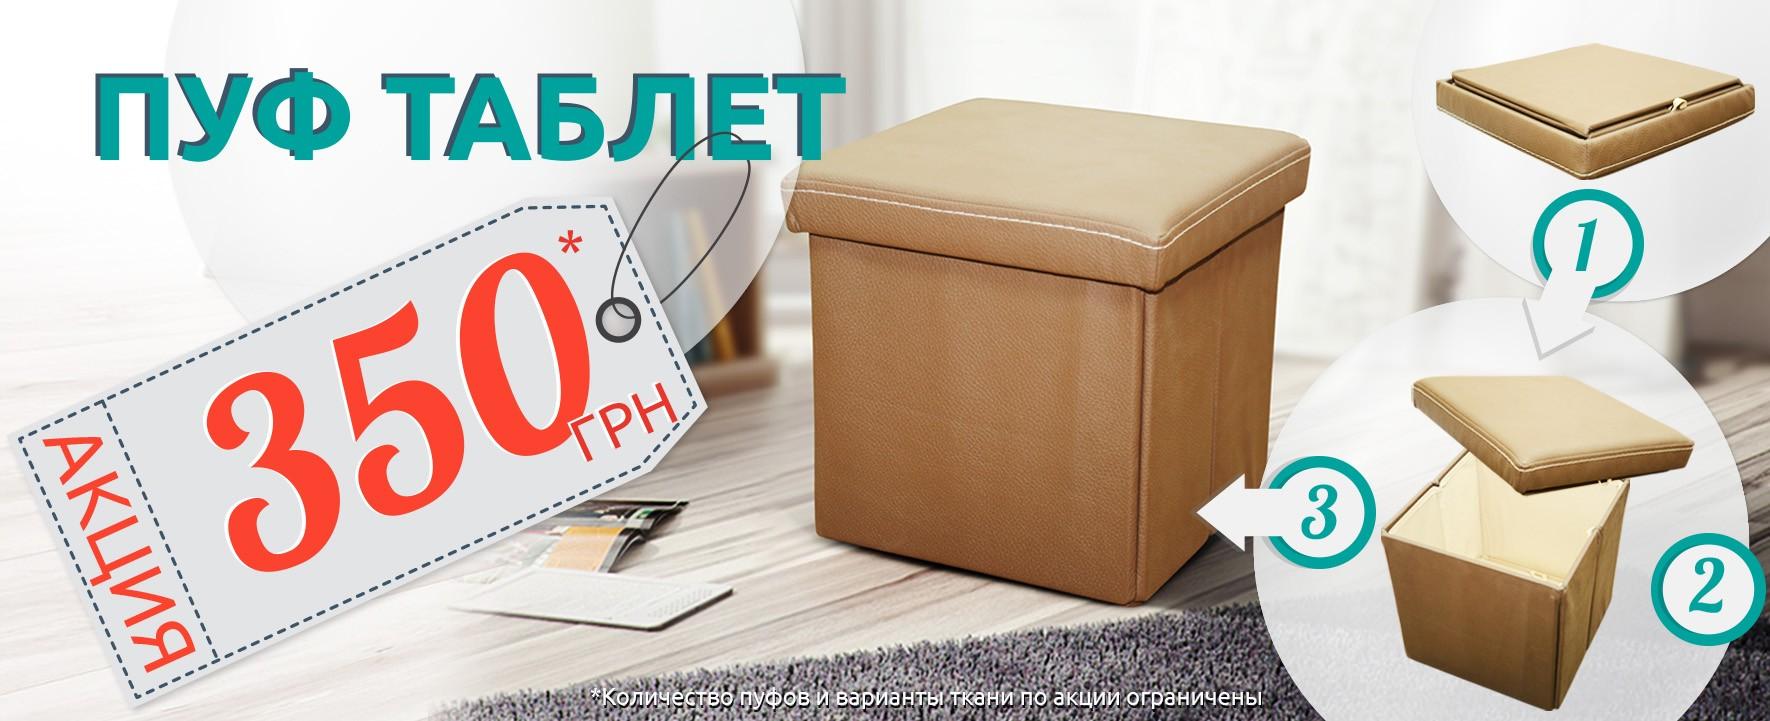 АКЦИЯ - пуф Таблет